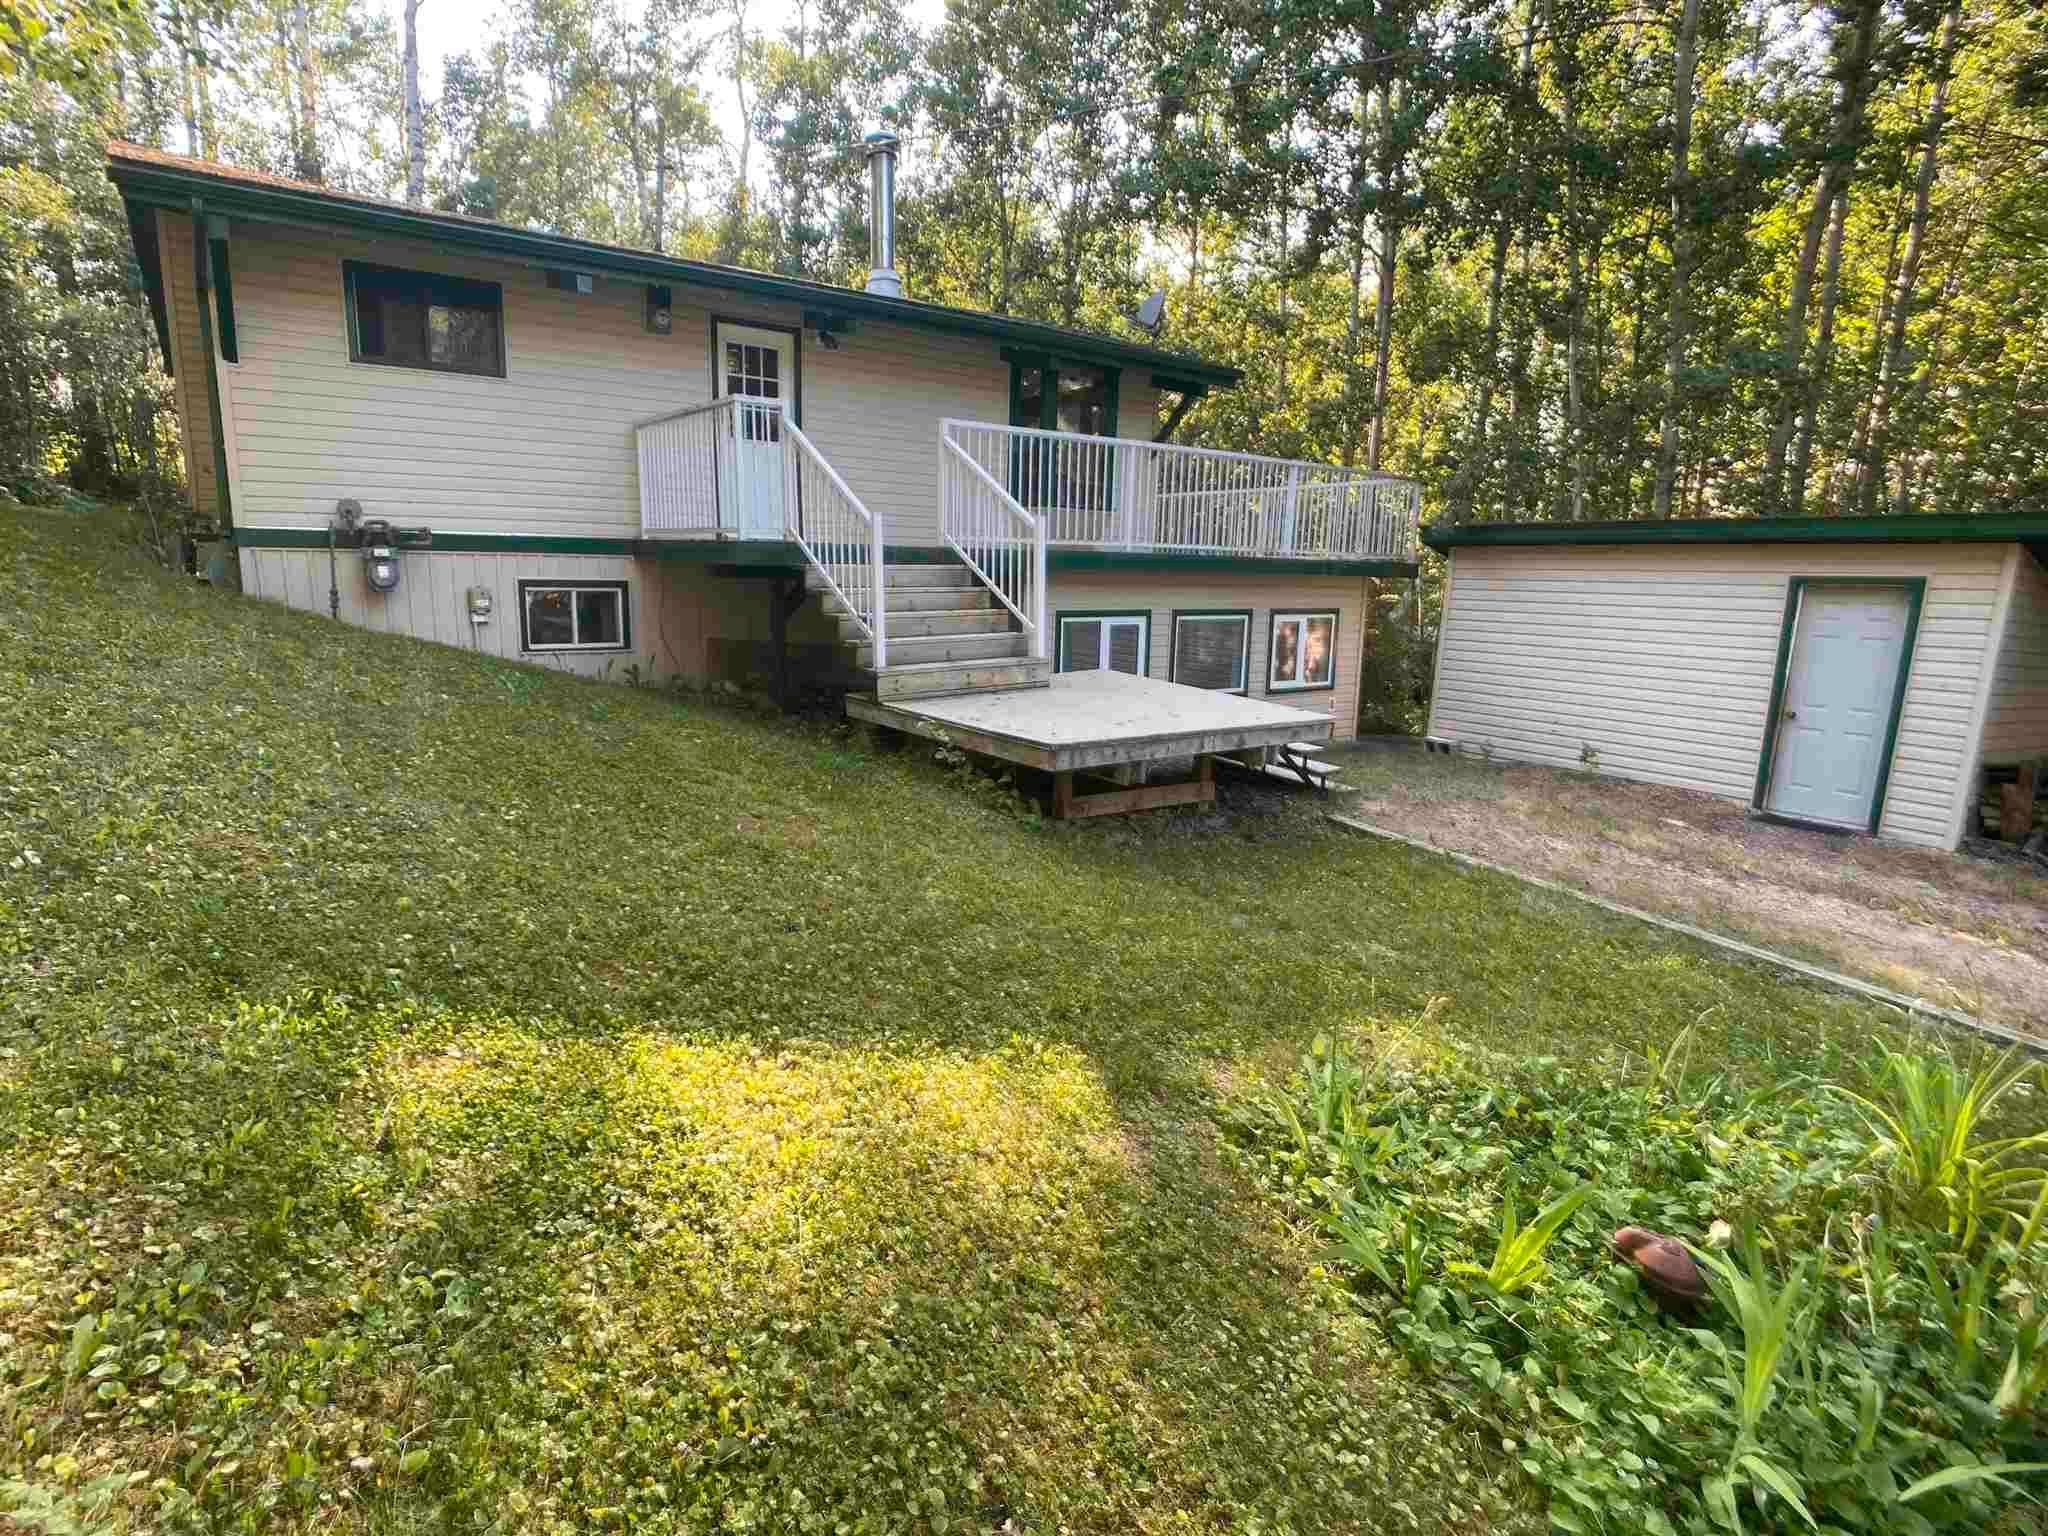 Main Photo: 6 Hazel Avenue: Rural Lac Ste. Anne County House for sale : MLS®# E4240805